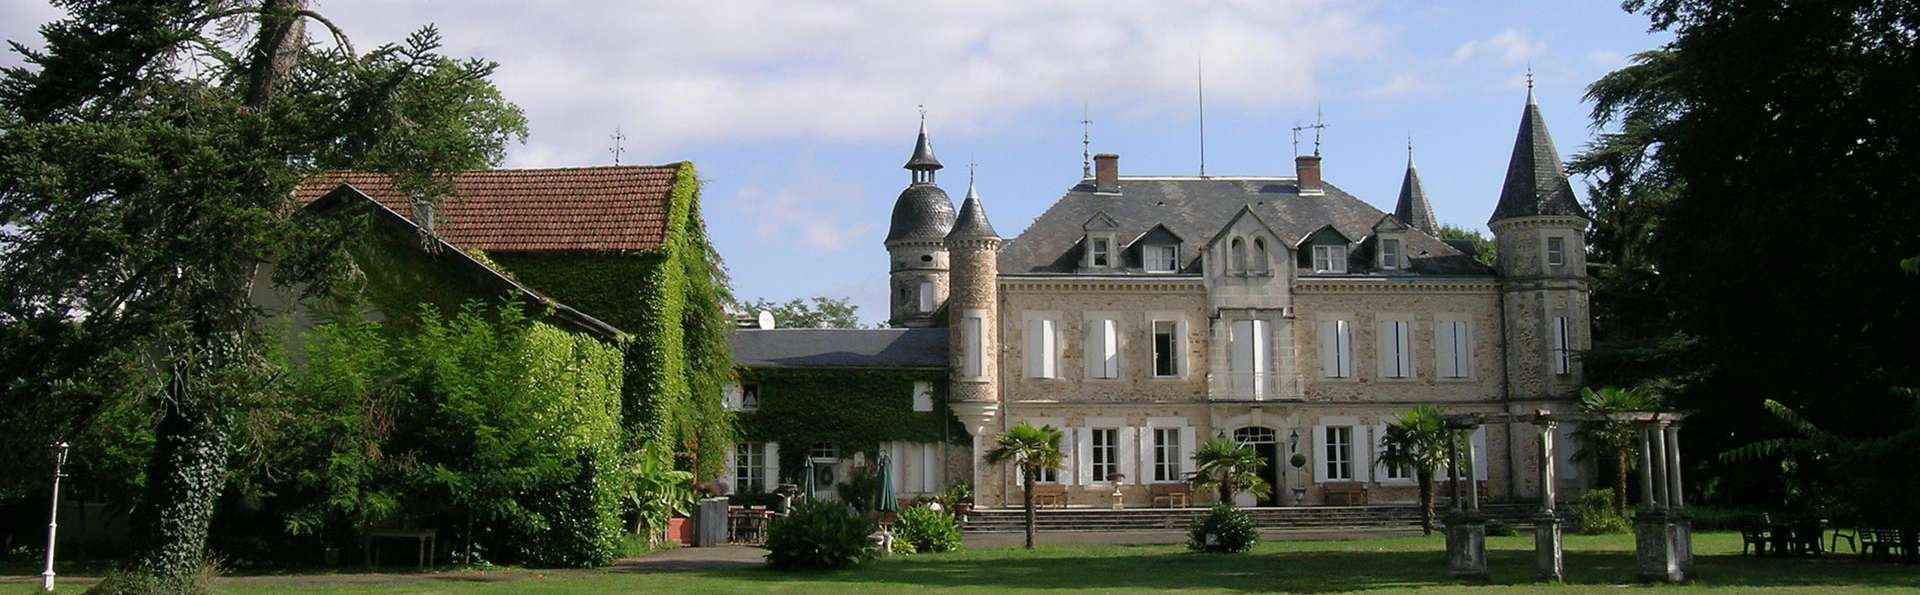 Château de Buros - edit_garden_front.jpg